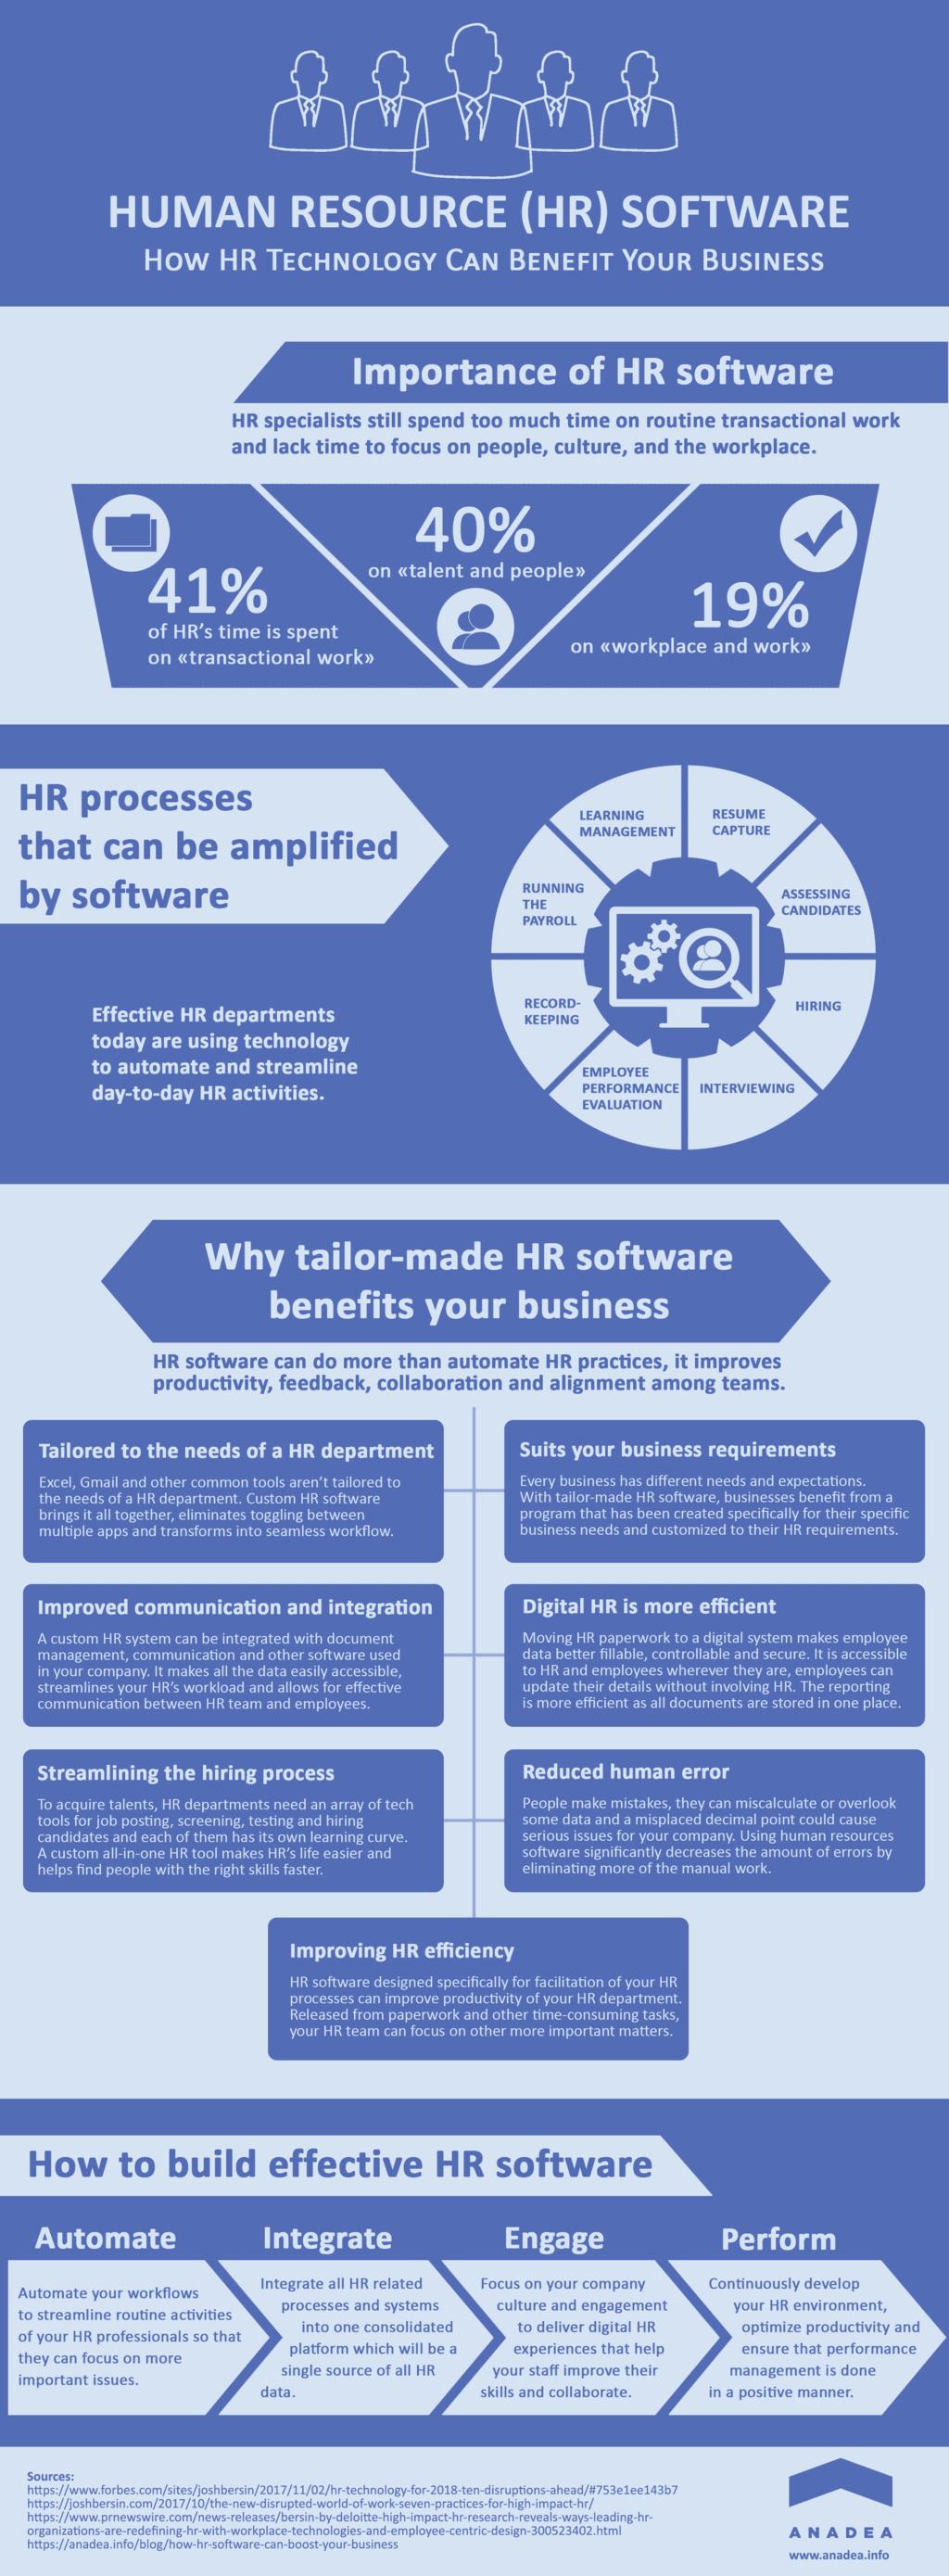 Human Resource Software: How HR Technology Can Benefit Your ... via Dariya Lopukhina